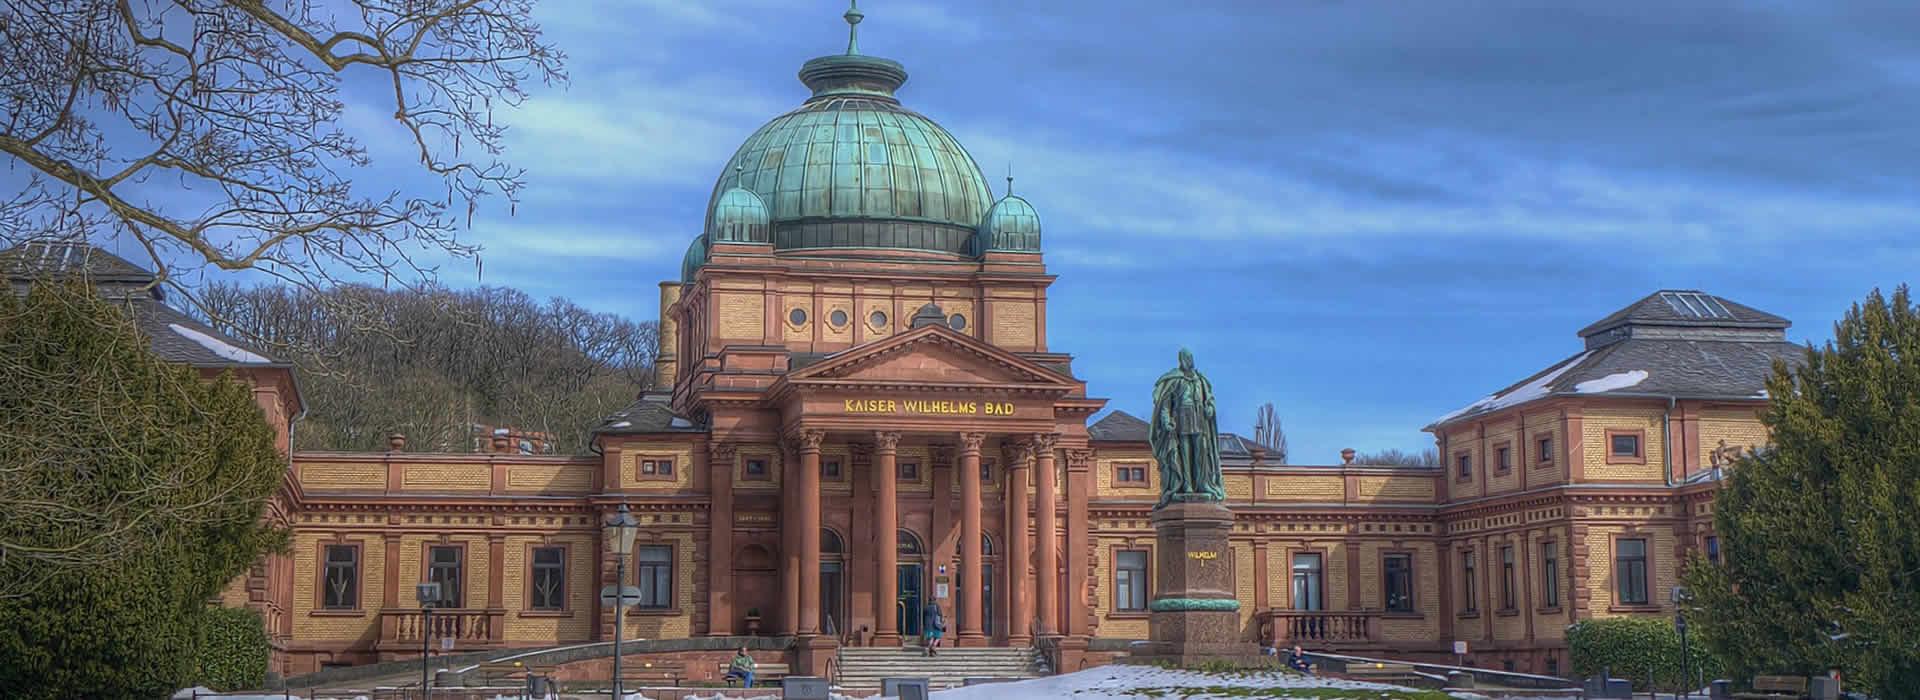 Bad Homburg: Website erstellen, Homepagegestaltung - Homepageerstellung - Homepageerstellung - Webdesign - Oberursel - Bad Homburg - Kronberg - Frankfurt am Main.